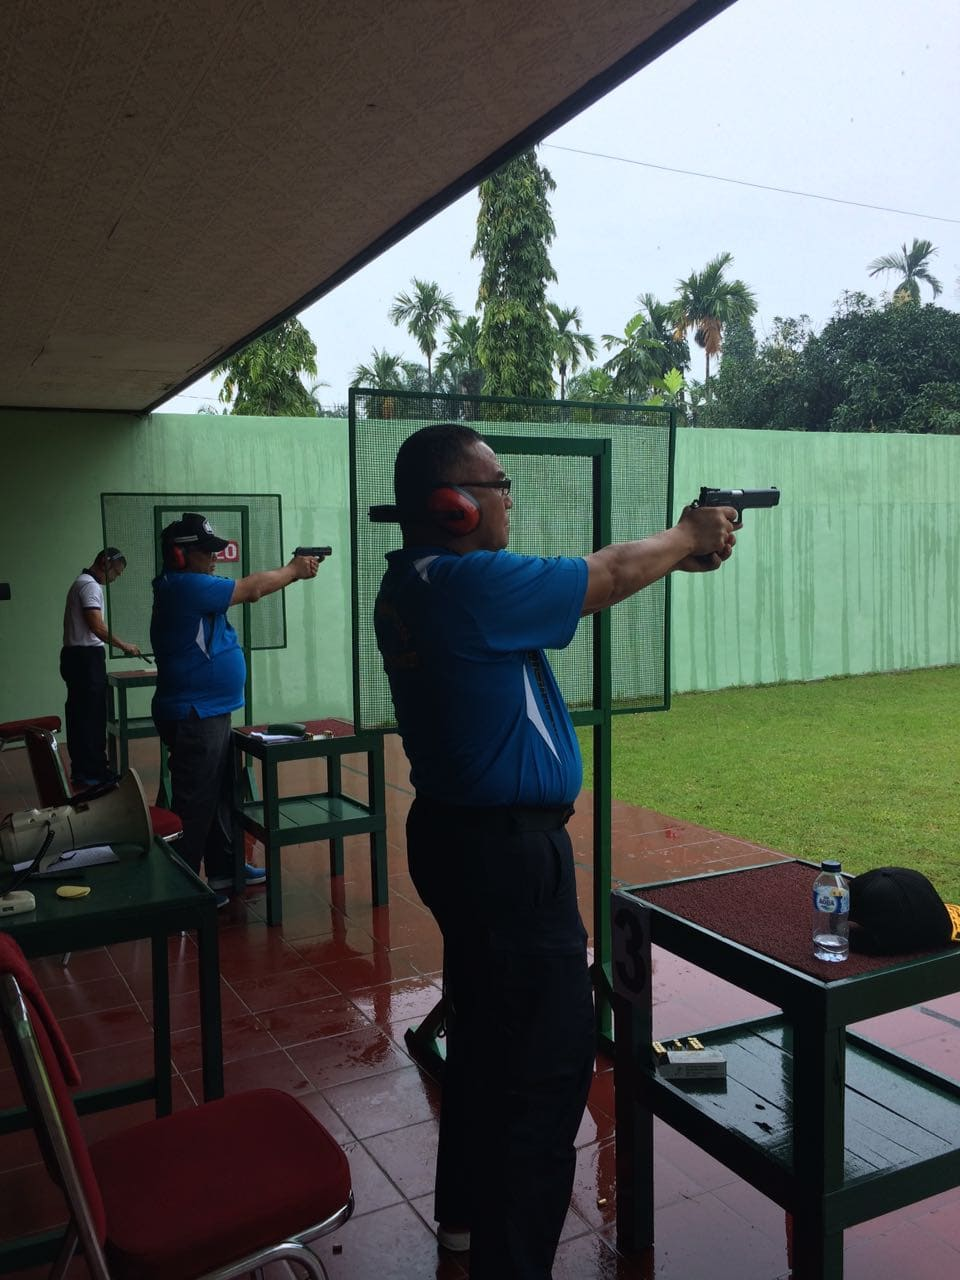 Sambut HUT ke-72 TNI, Kodam I/BB Gelar Lomba Tembak